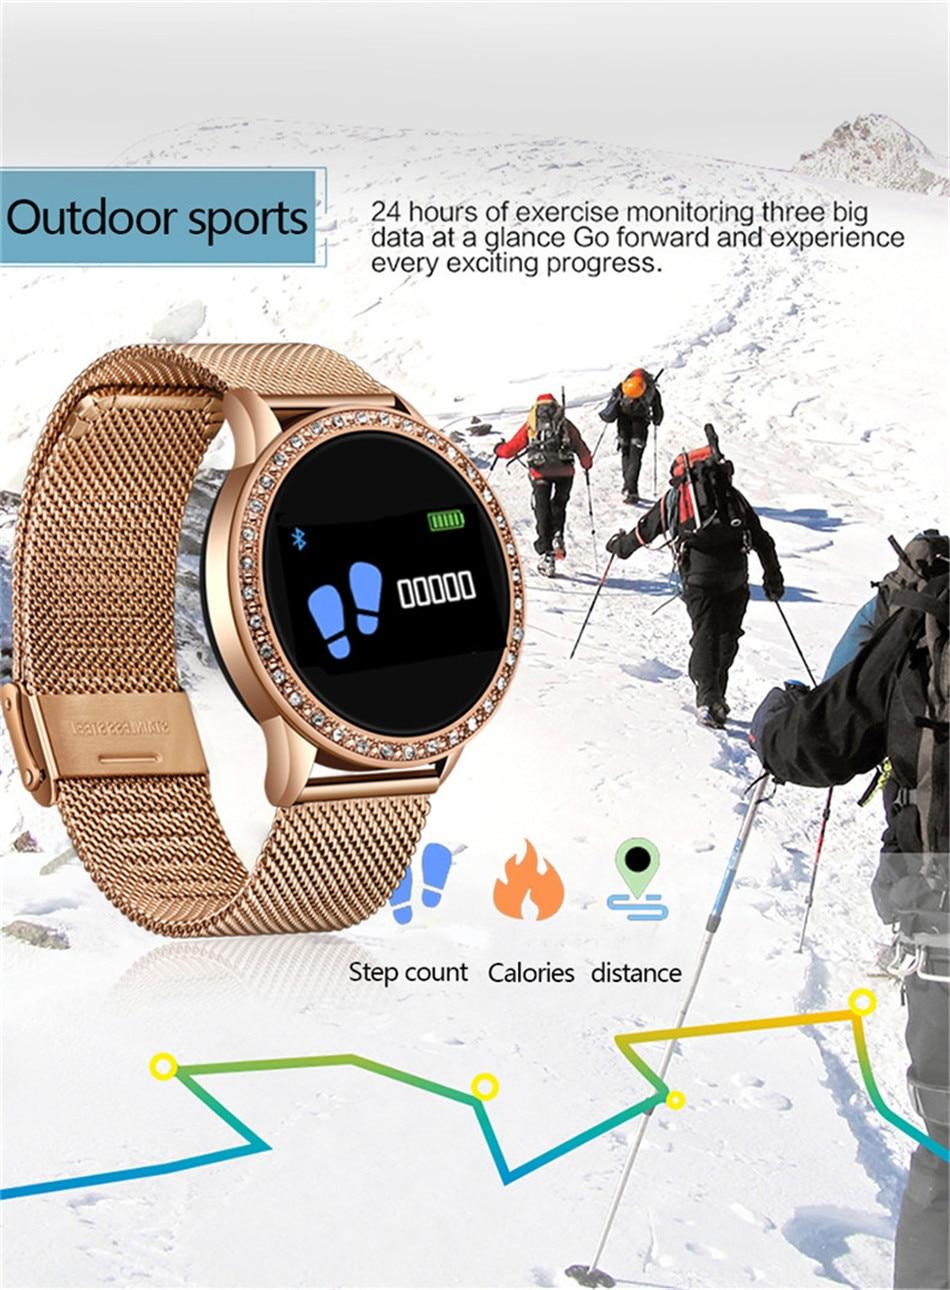 HTB1oiGTbbr1gK0jSZR0q6zP8XXaA LIGE New Smart Bracelet Women Health Watch Activity Fitness Tracker Blood Pressure Heart Rate Monitor Smart Wristband fit bit